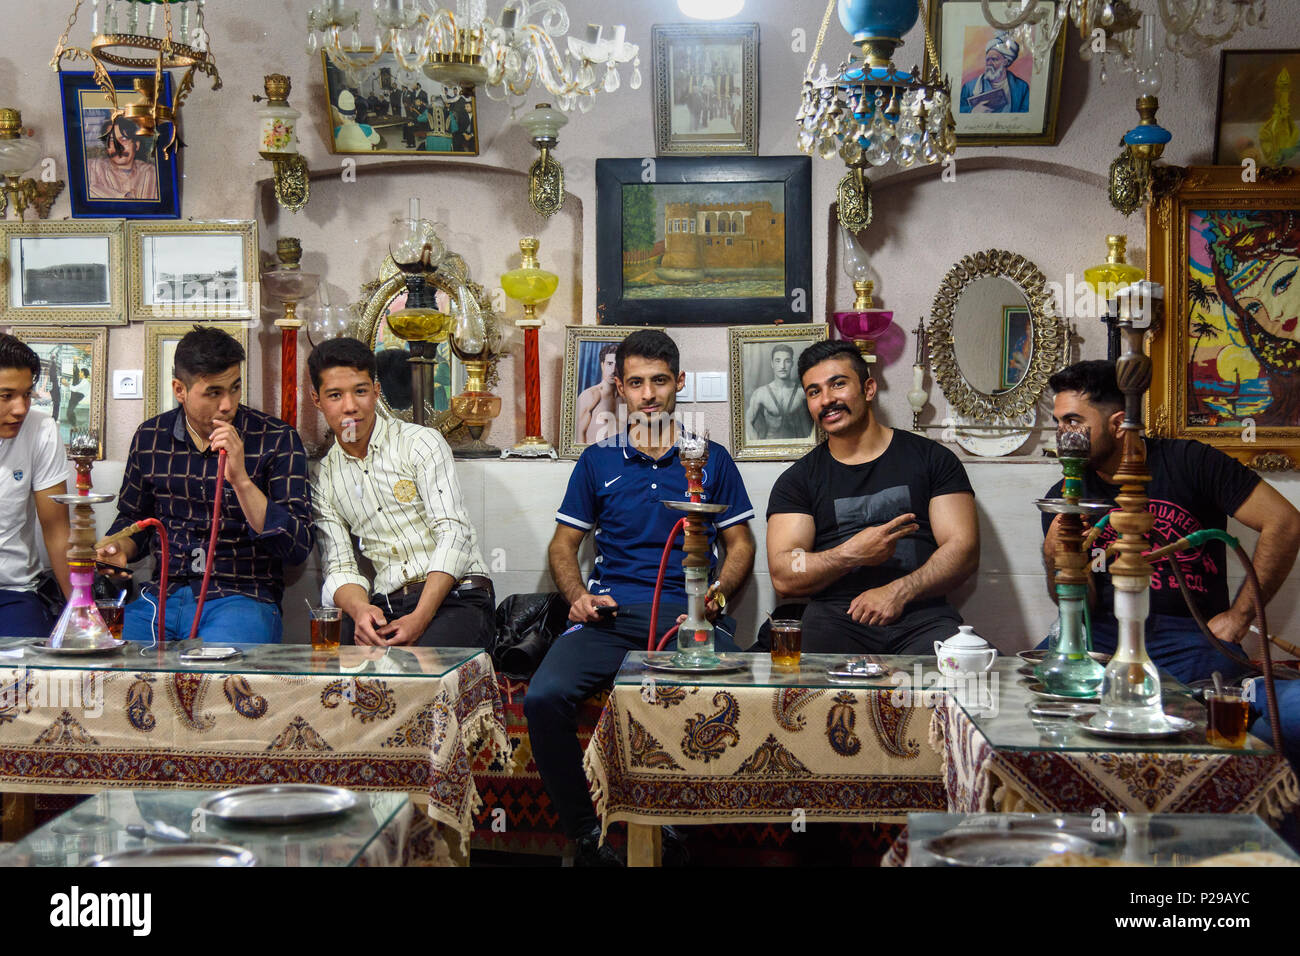 isfahan-iran-march-21-2018-iranian-men-s